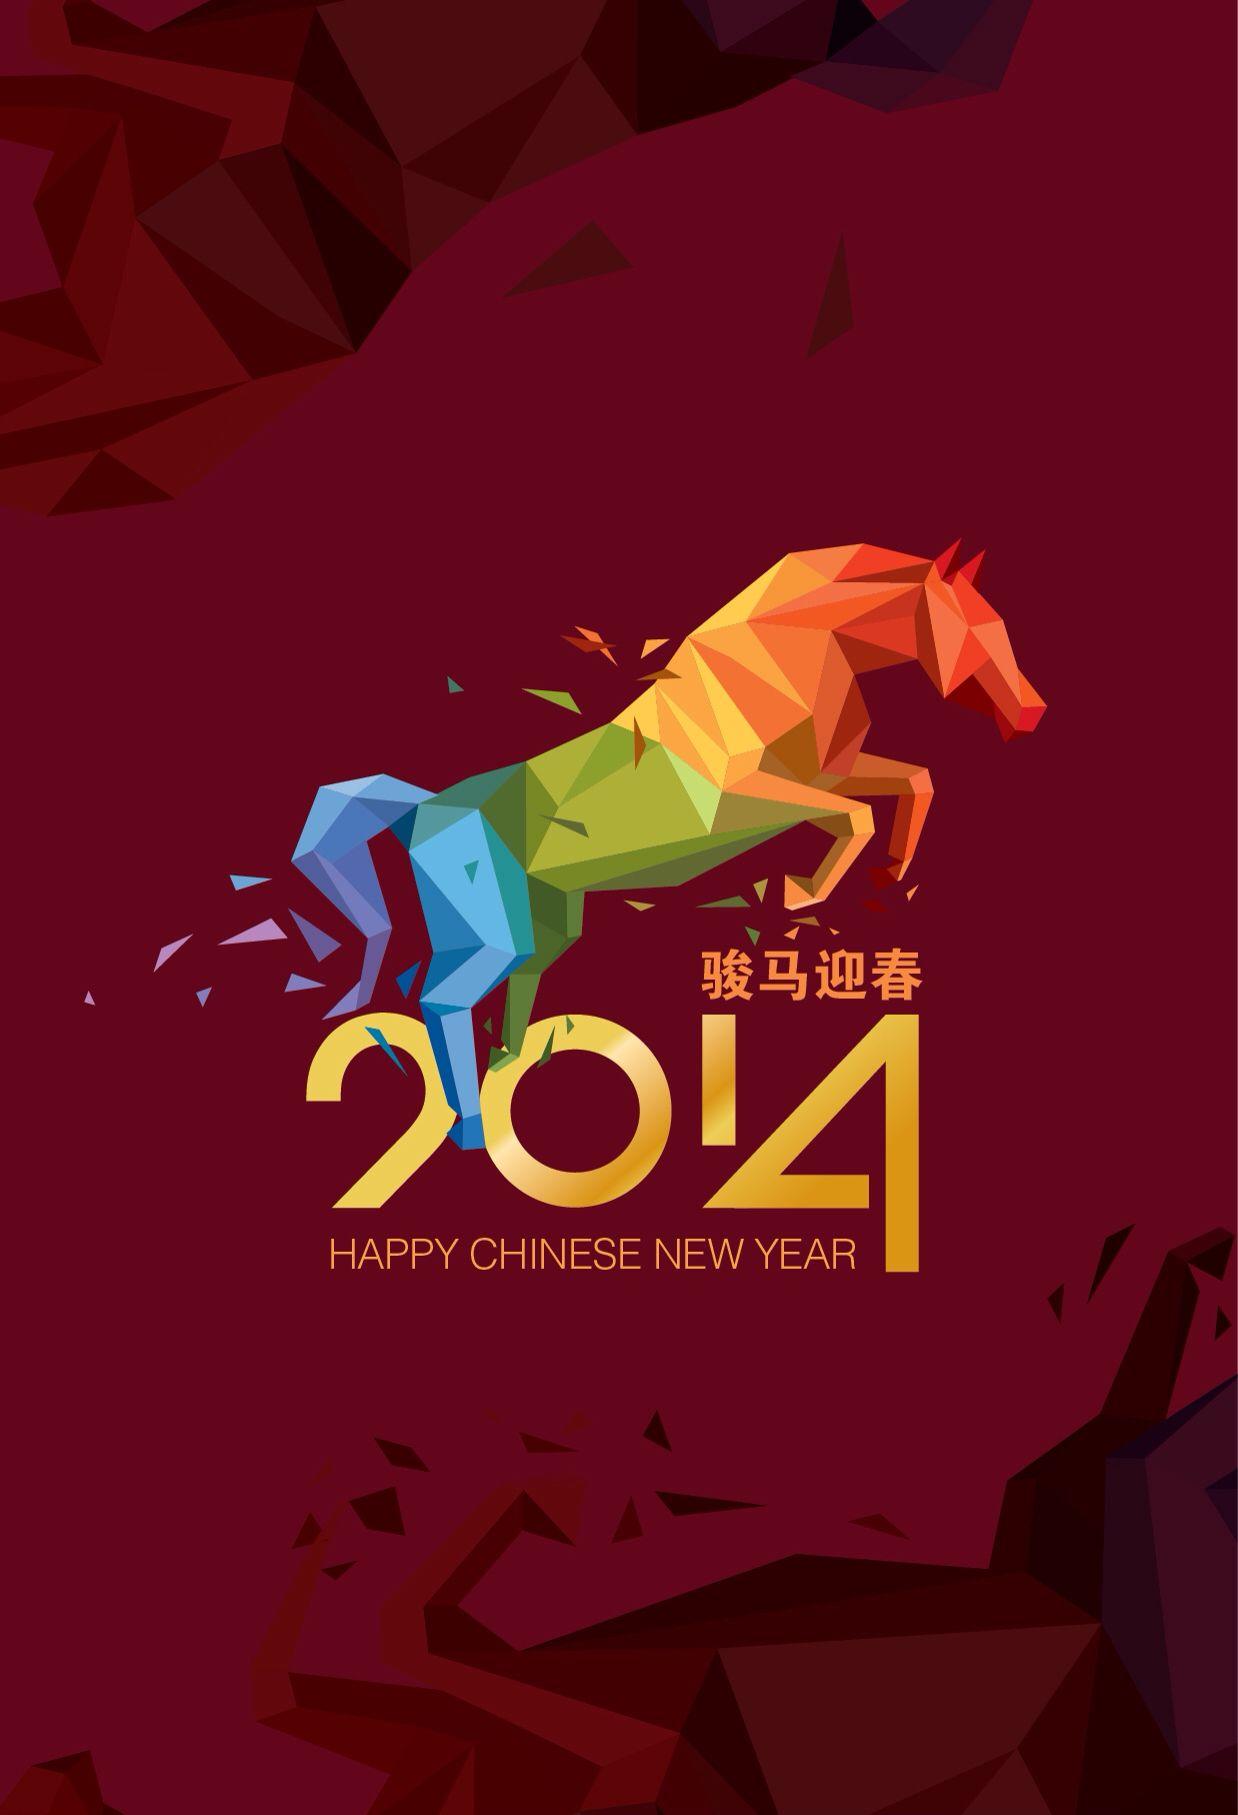 Poster design 2014 - Cny 2014 Horse Poster Design